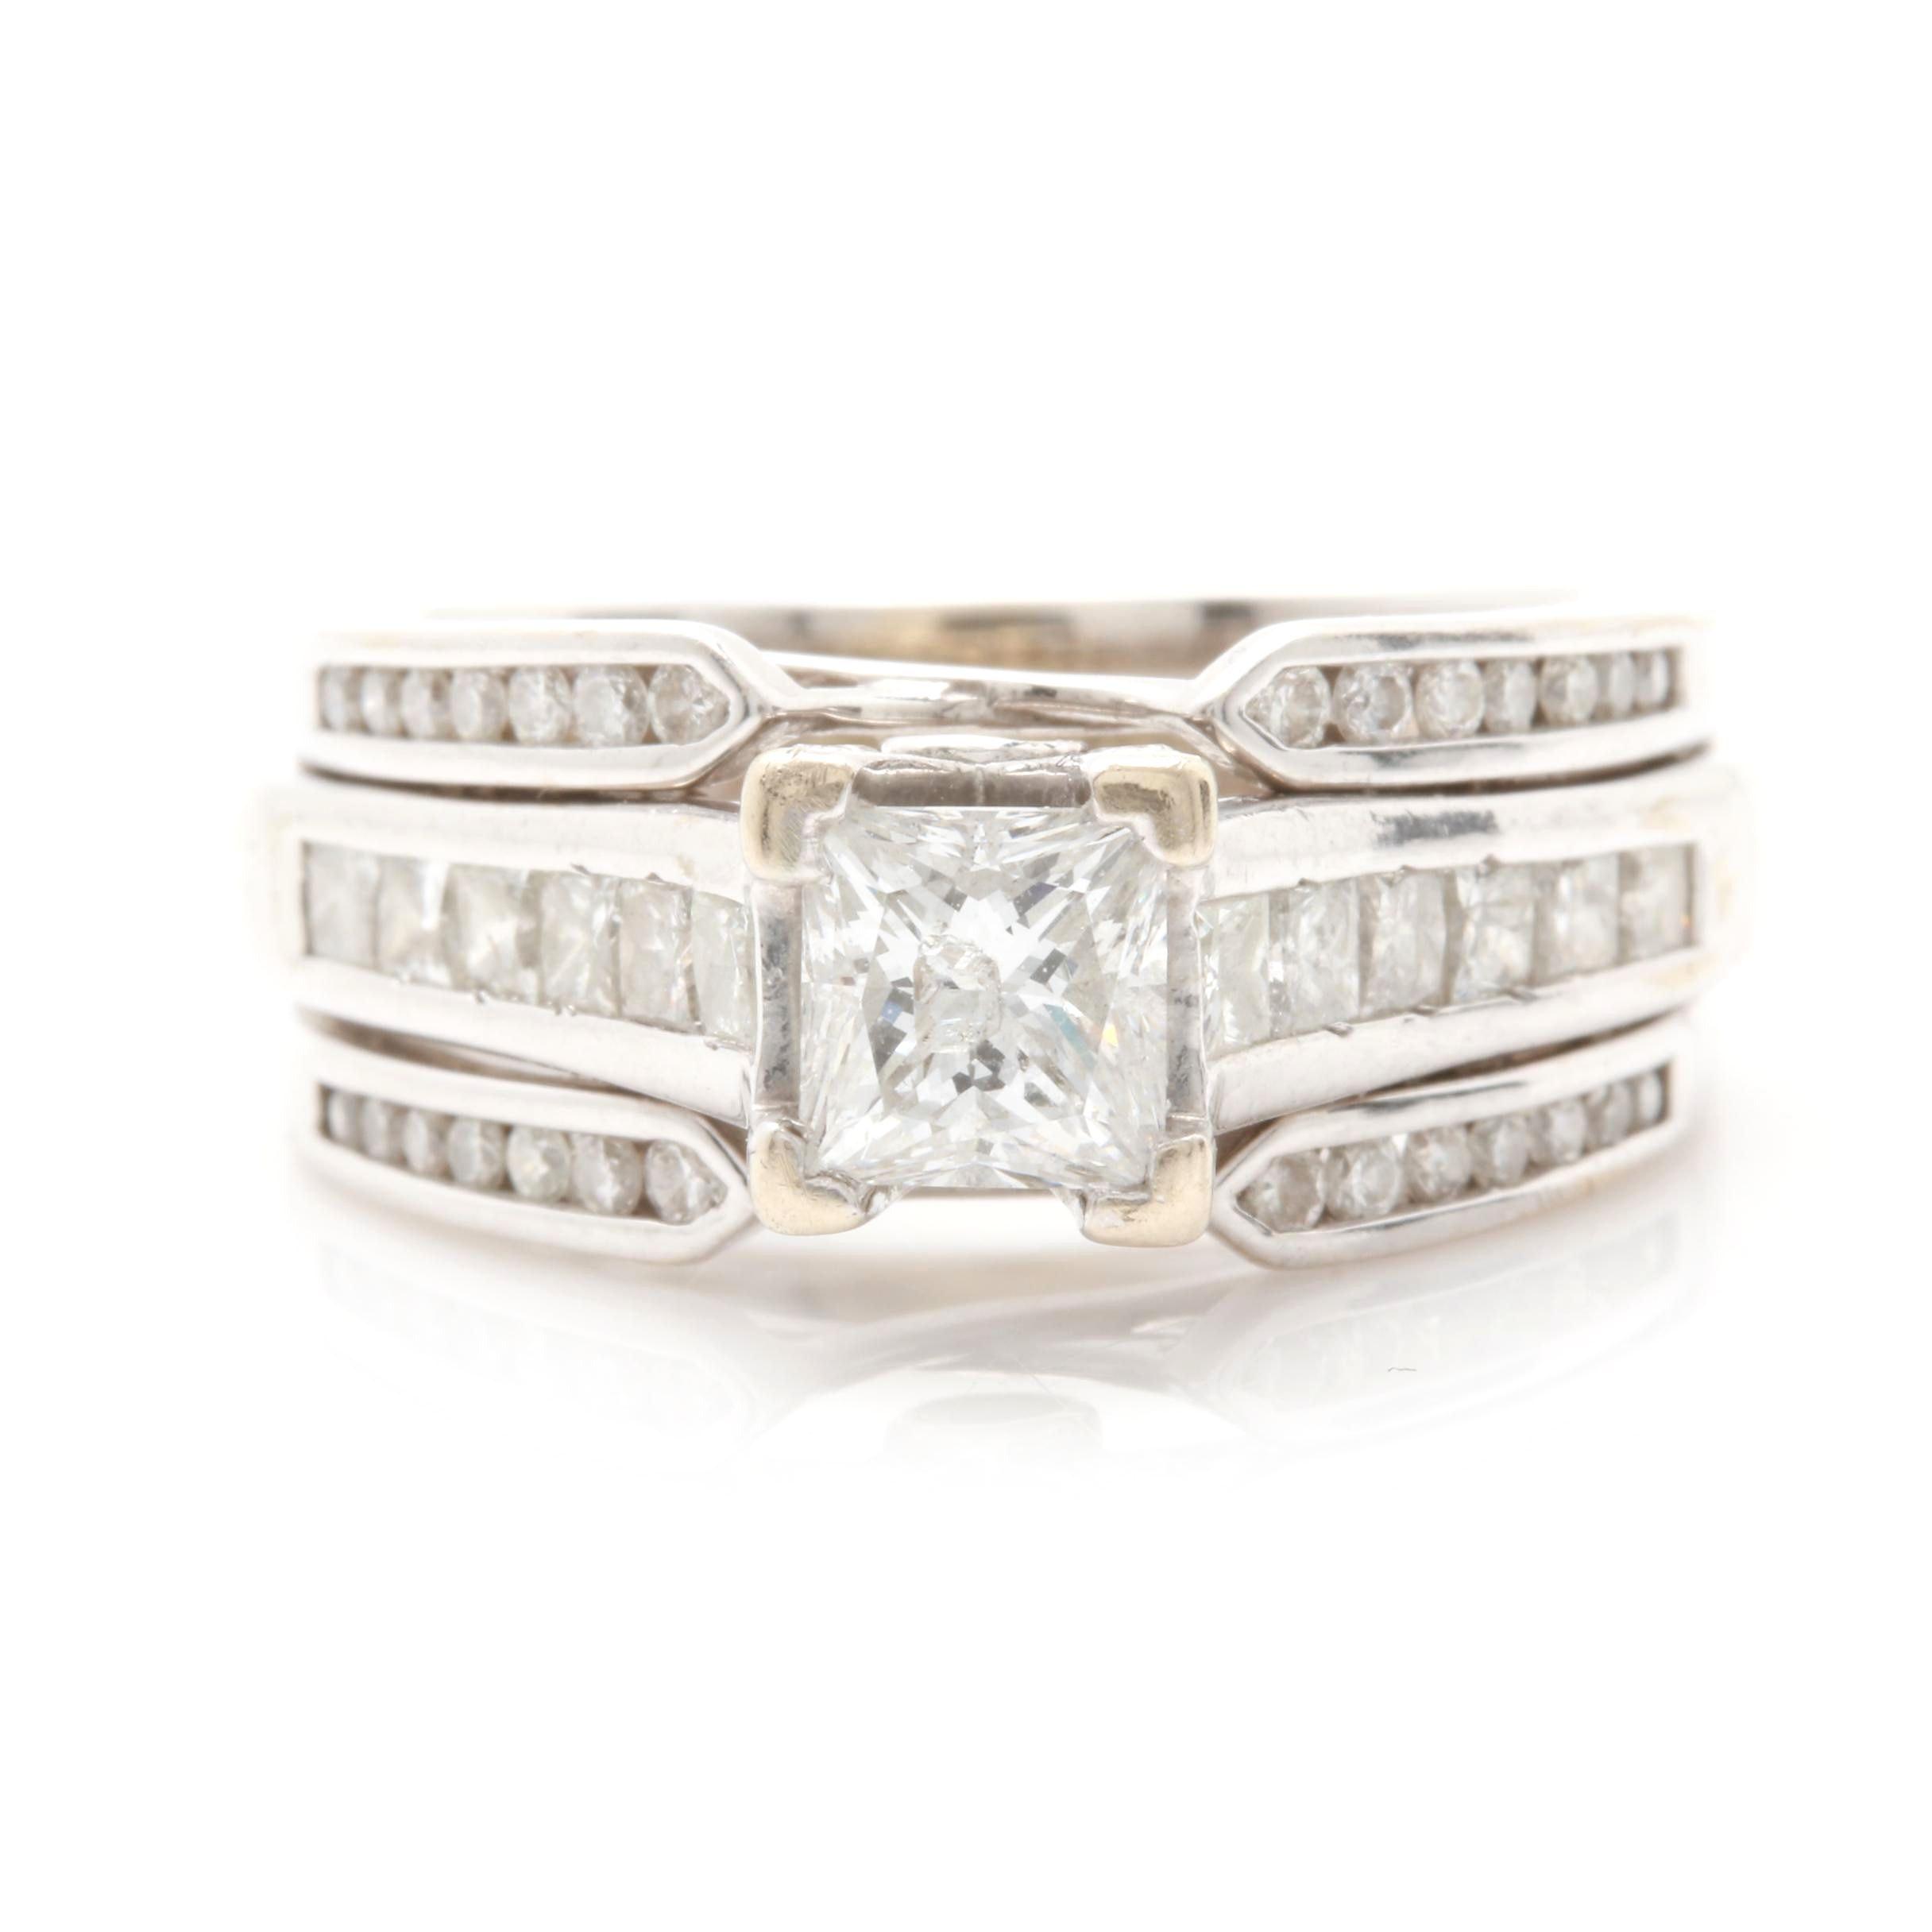 14K and 18K White Gold 1.20 CTW Diamond Ring